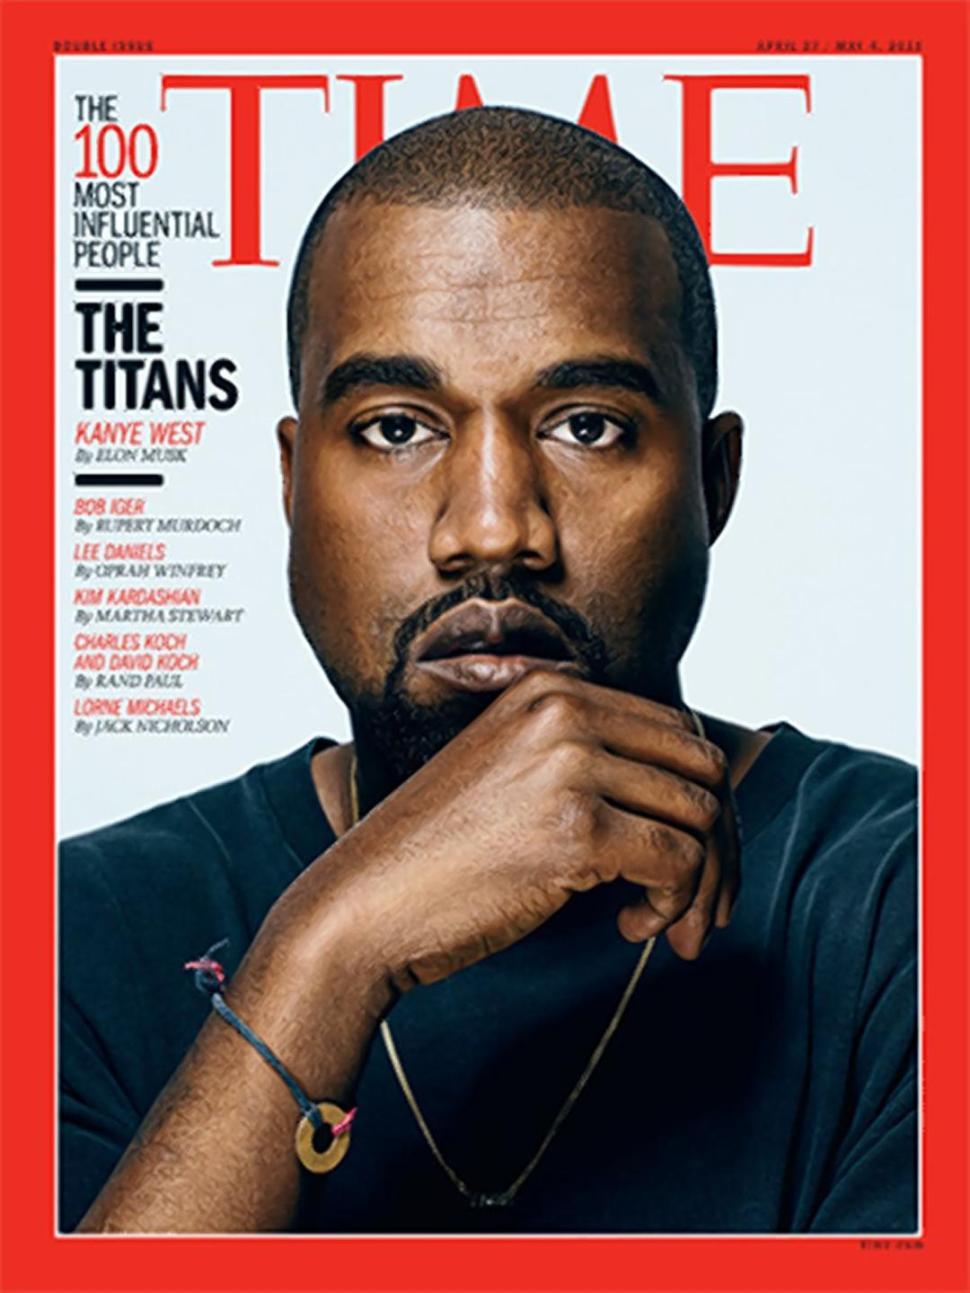 Kanye West Makes TIME's 100 List